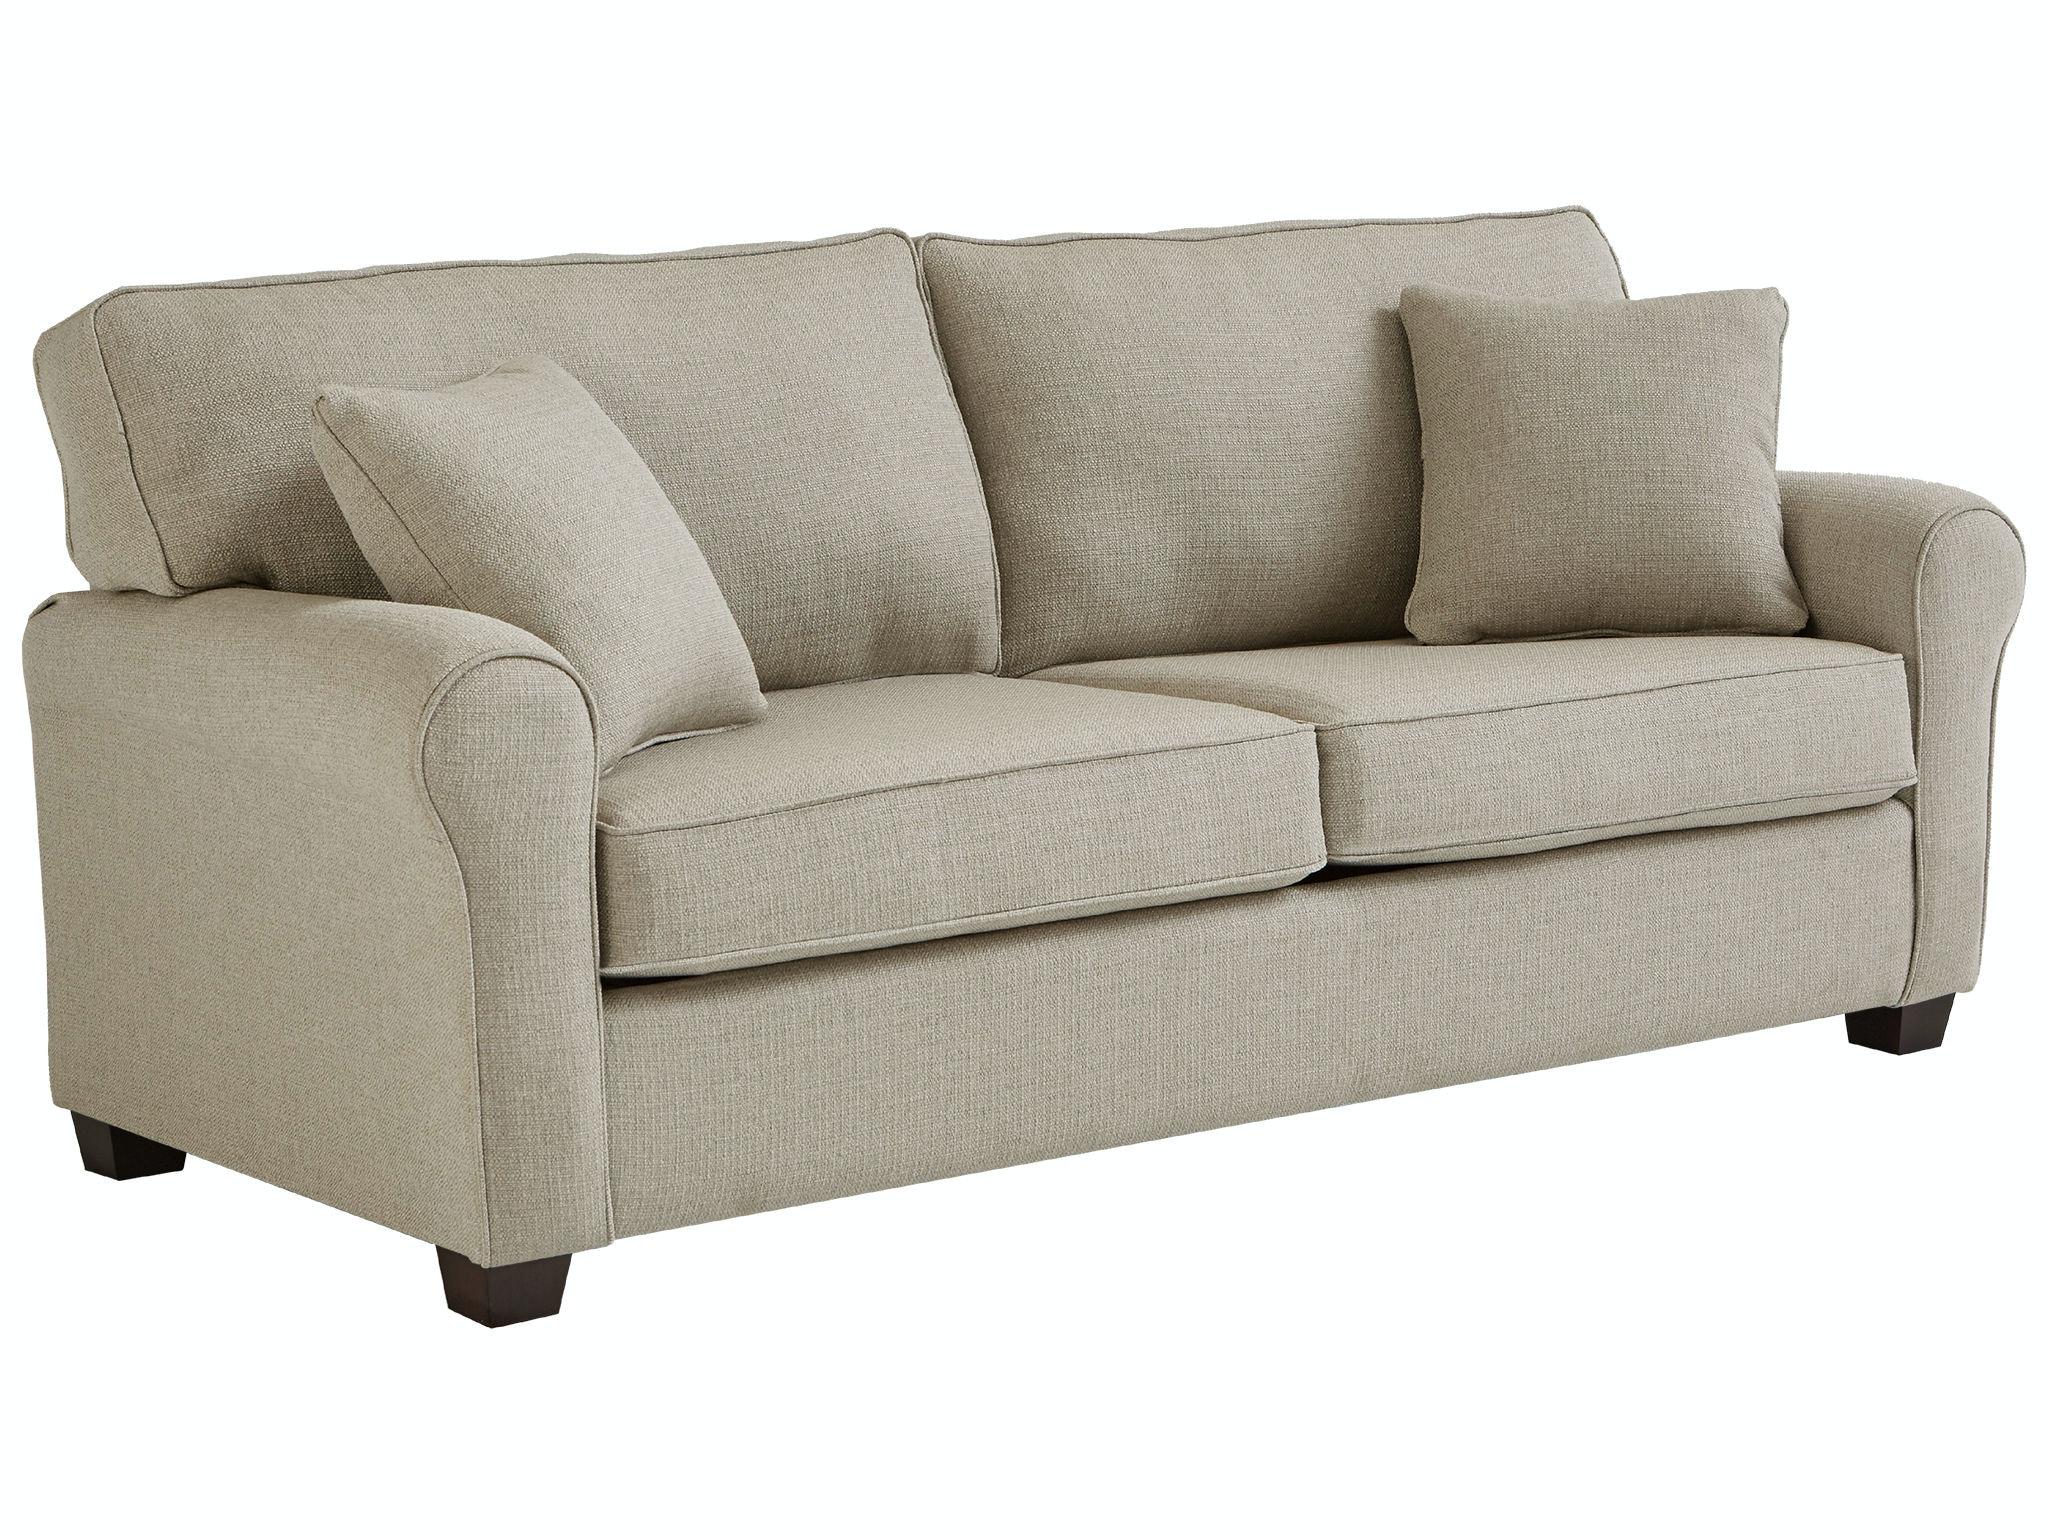 Best Home Furnishings Living Room Shannon Sofa